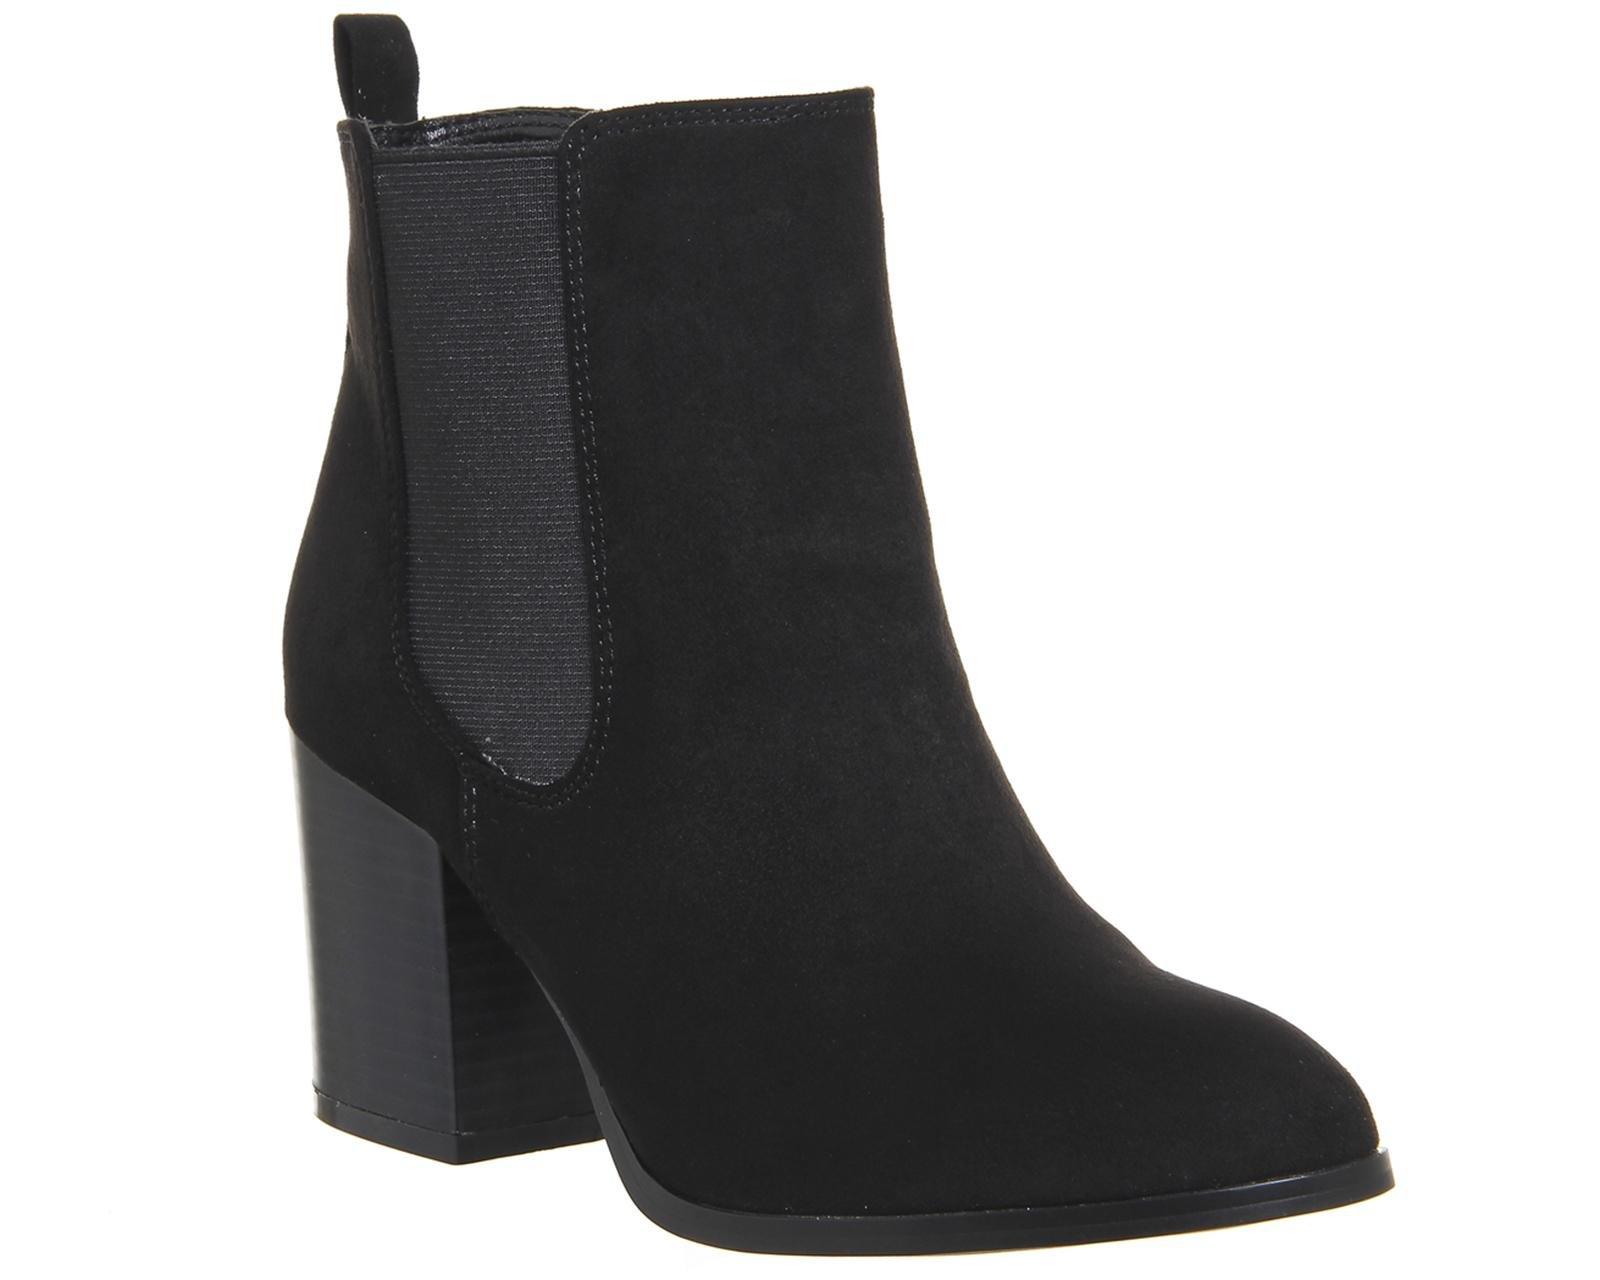 office block heel chelsea boots in black lyst